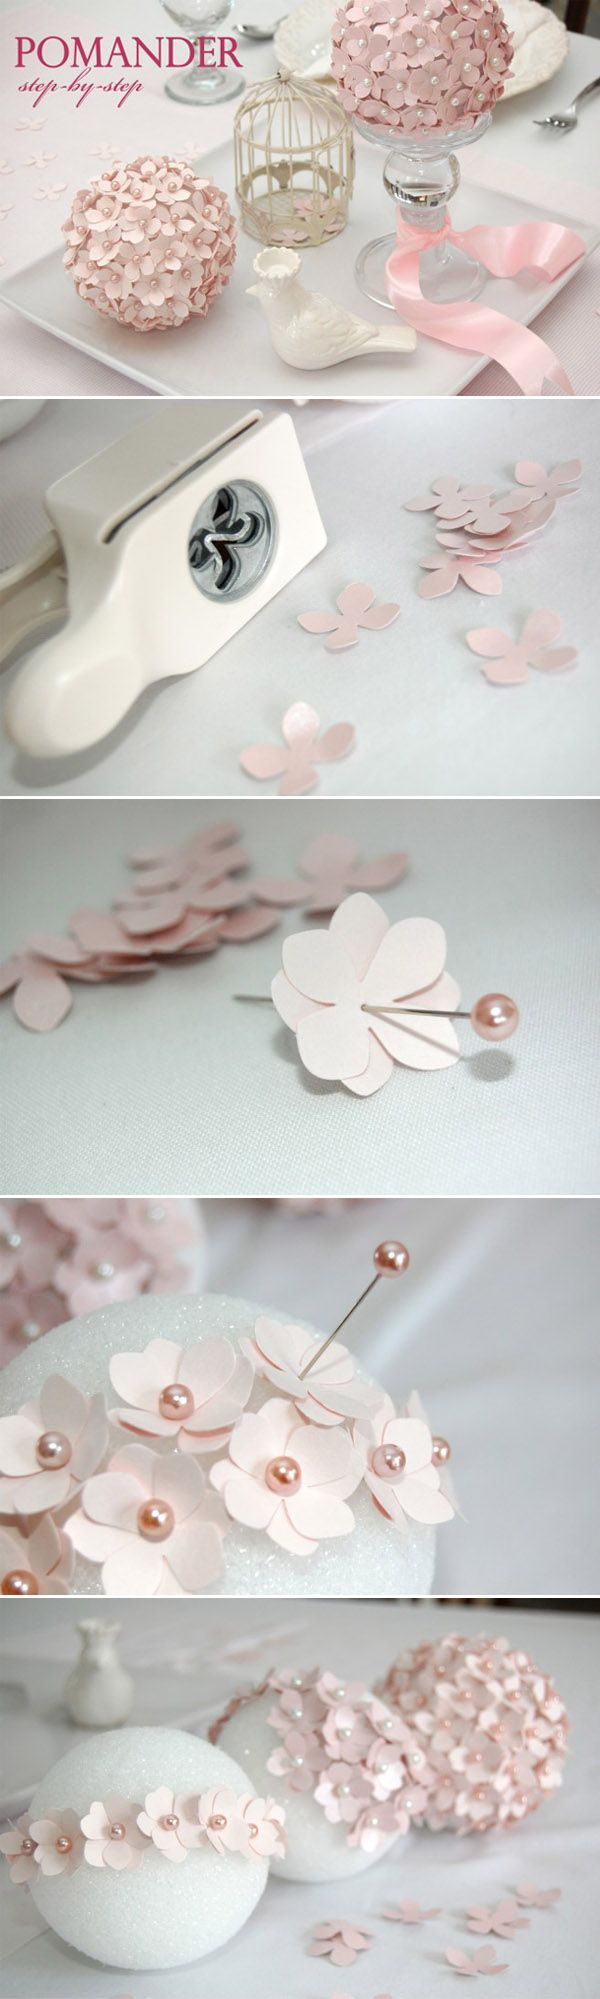 Diy flower decorations wedding   Creative DIY Wedding Centerpieces with Tutorials  Flower ball